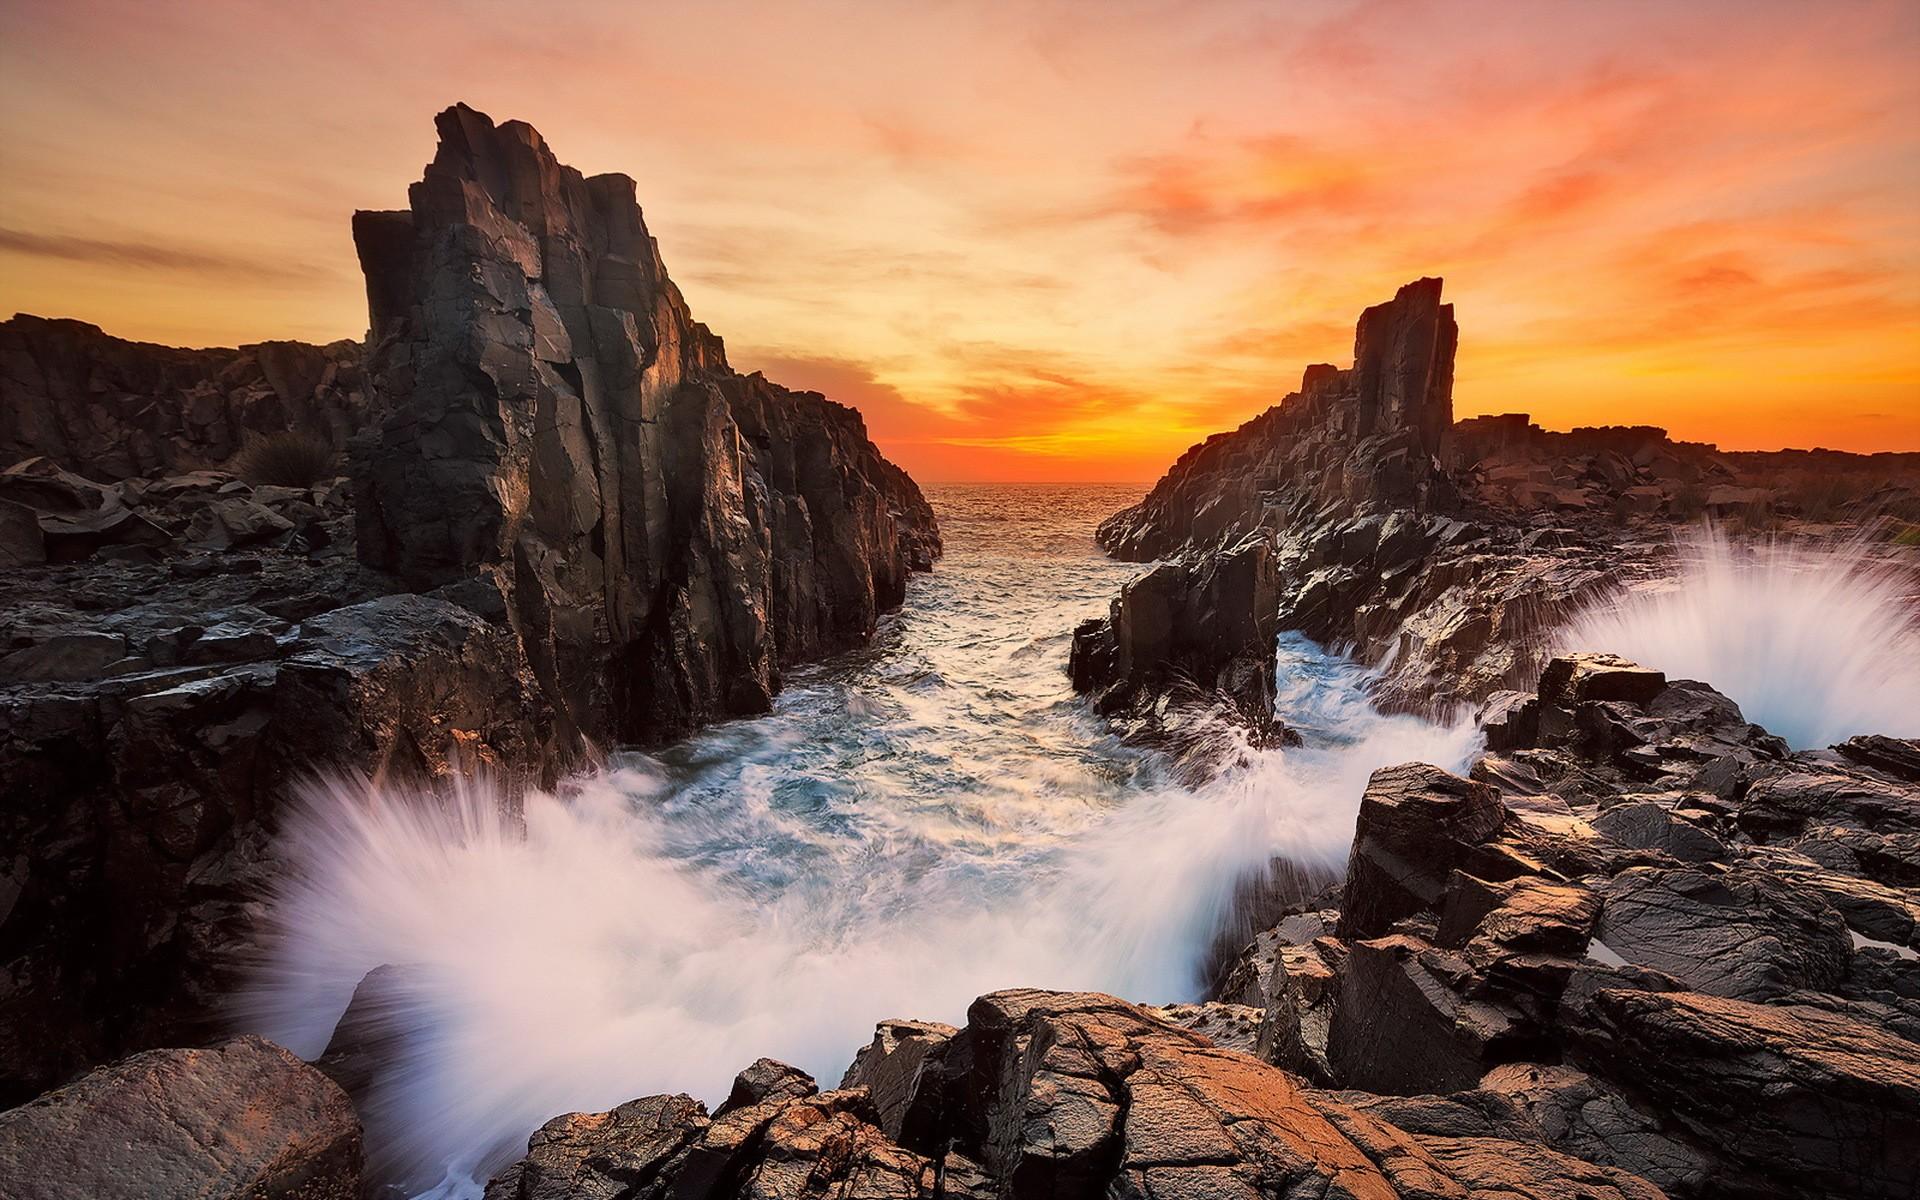 General 1920x1200 landscape Australia New South Wales orange sky sea rock formation